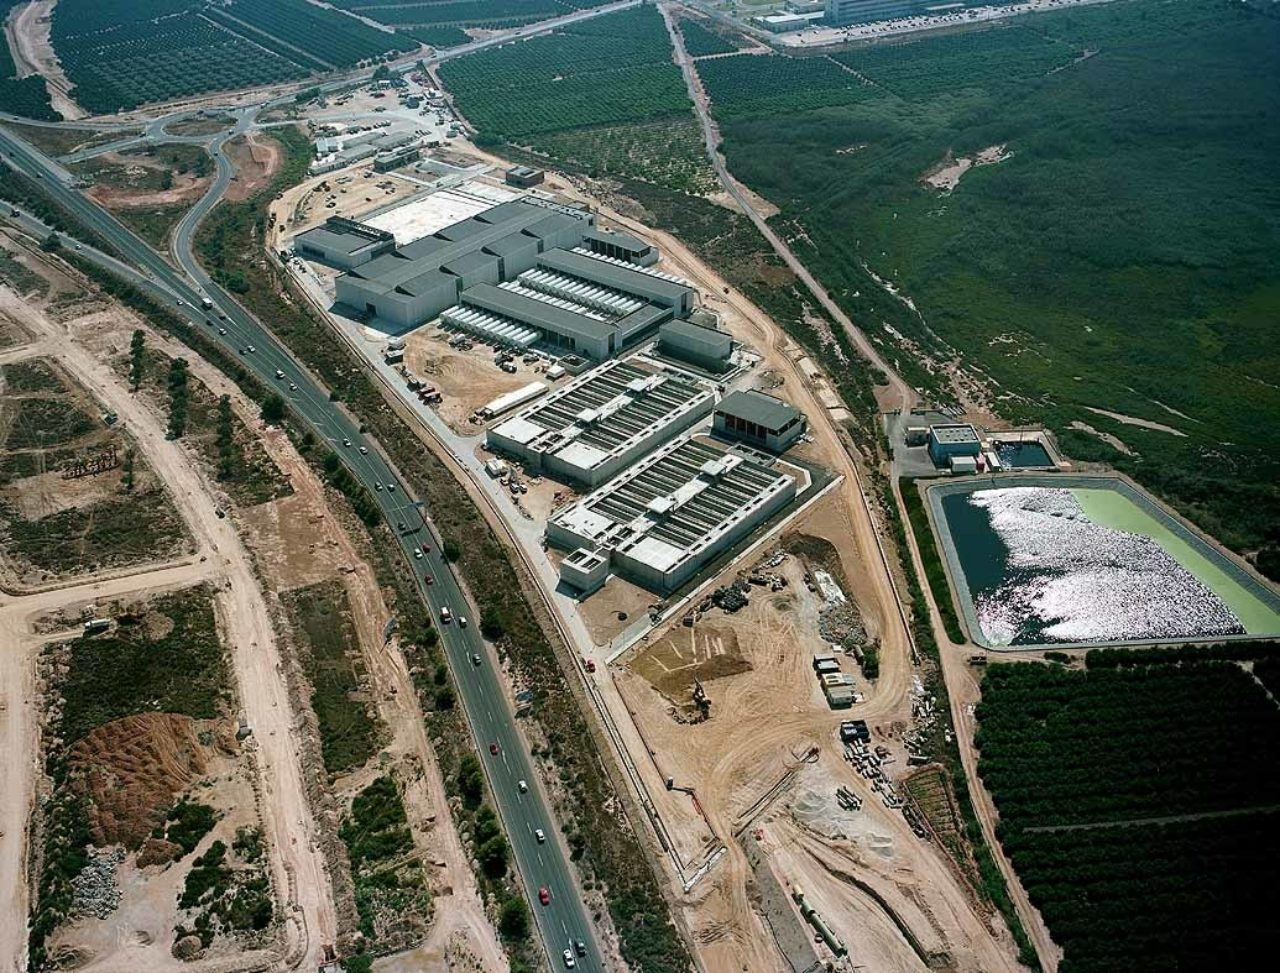 EU Waste Massive Spanish Desalination Plant Lies Idle